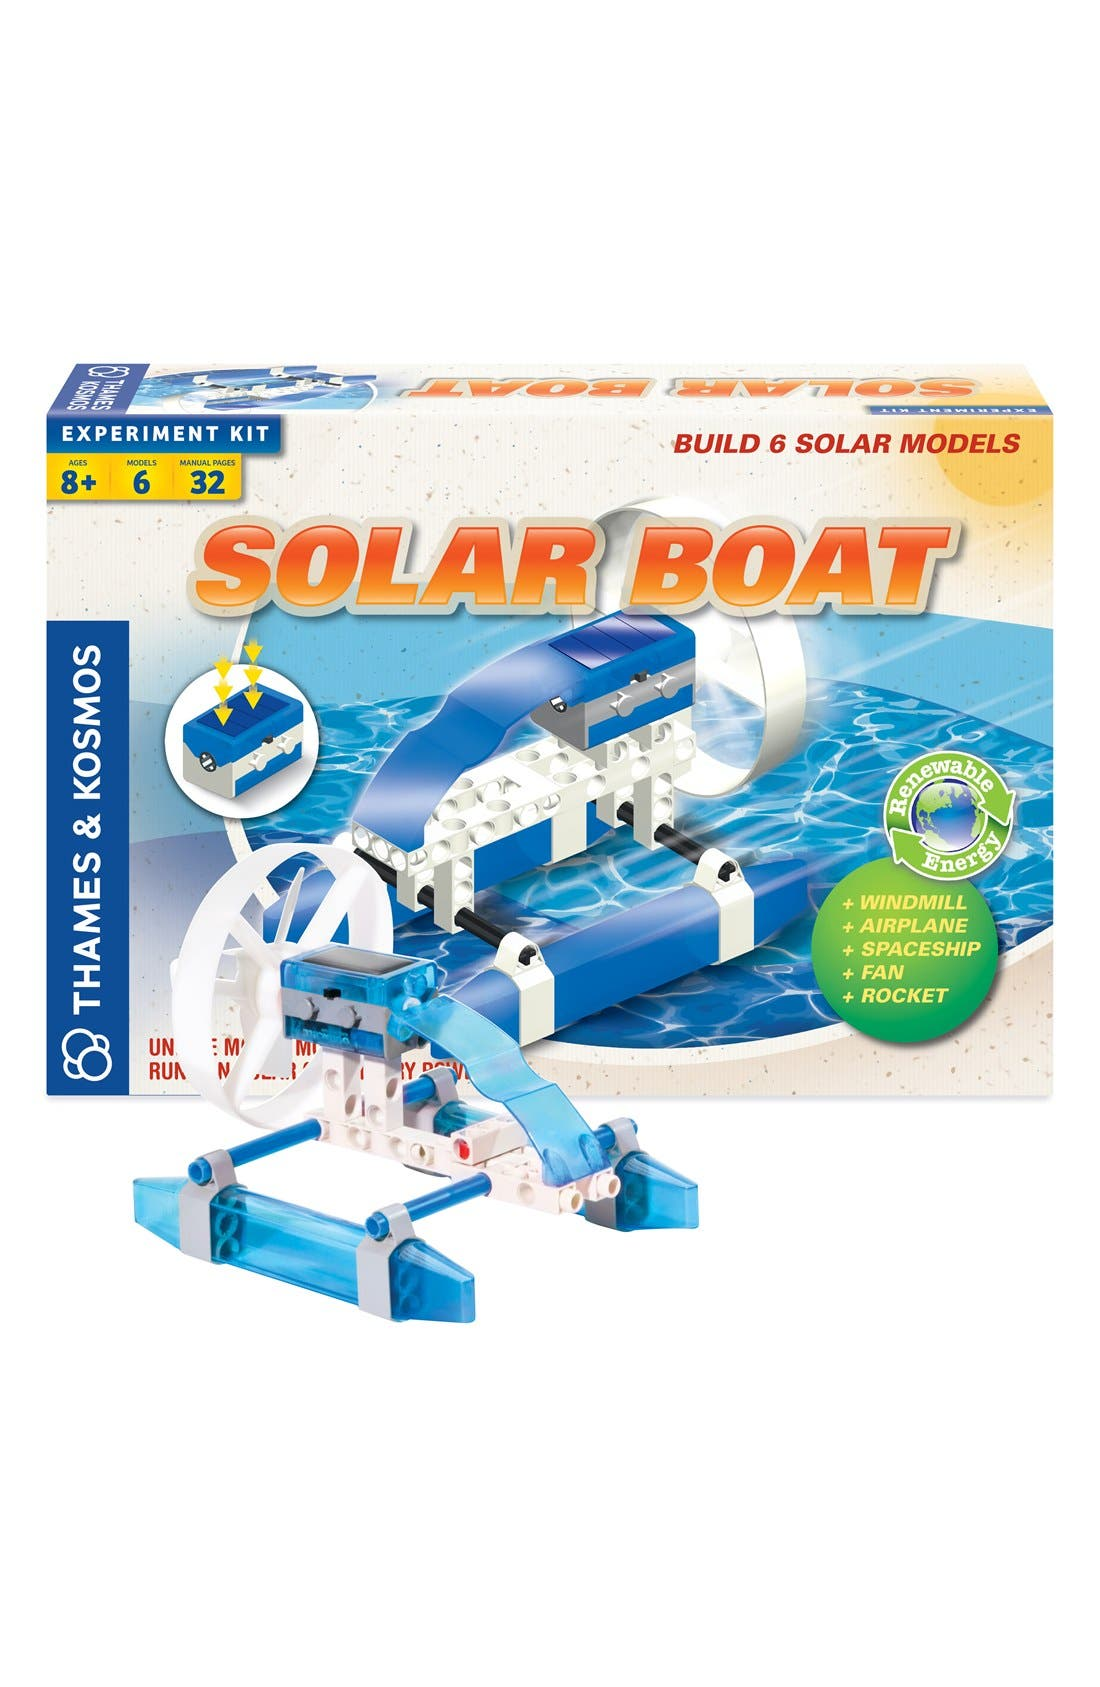 Thames & Kosmos 'Solar Boat' Experiment Kit